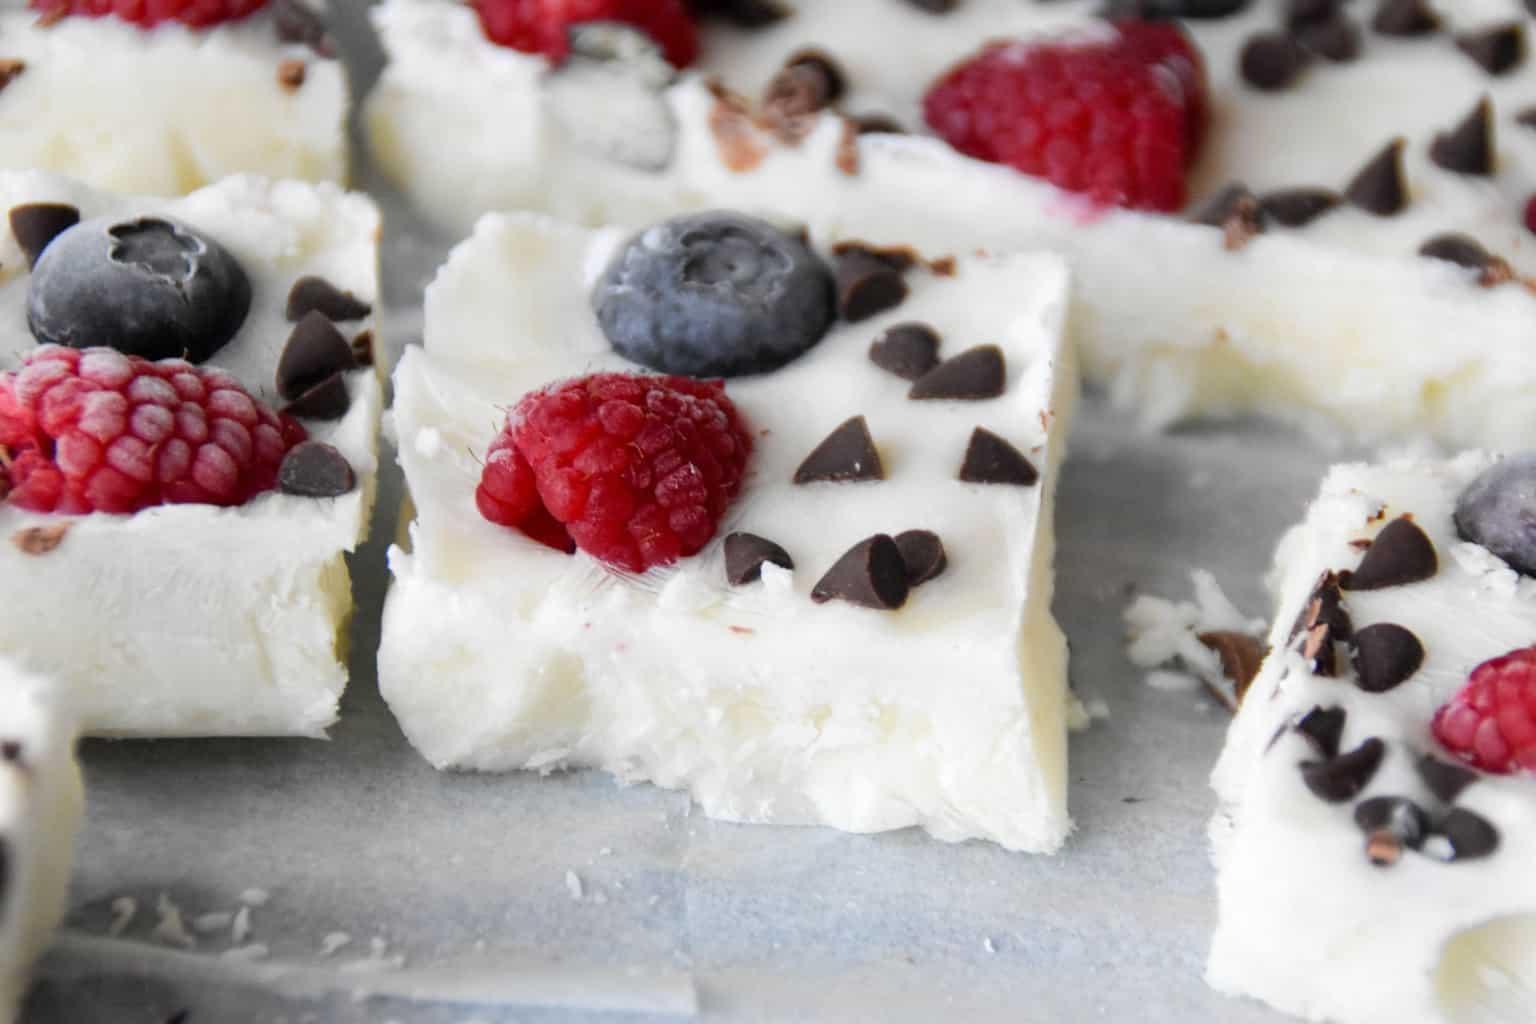 "<img src=""https://cdn.shortpixel.ai/client/q_glossy,ret_img,w_1536,h_1024/Yogurt Bark .jpg"" alt="" Homemade Yogurt Bark "">"